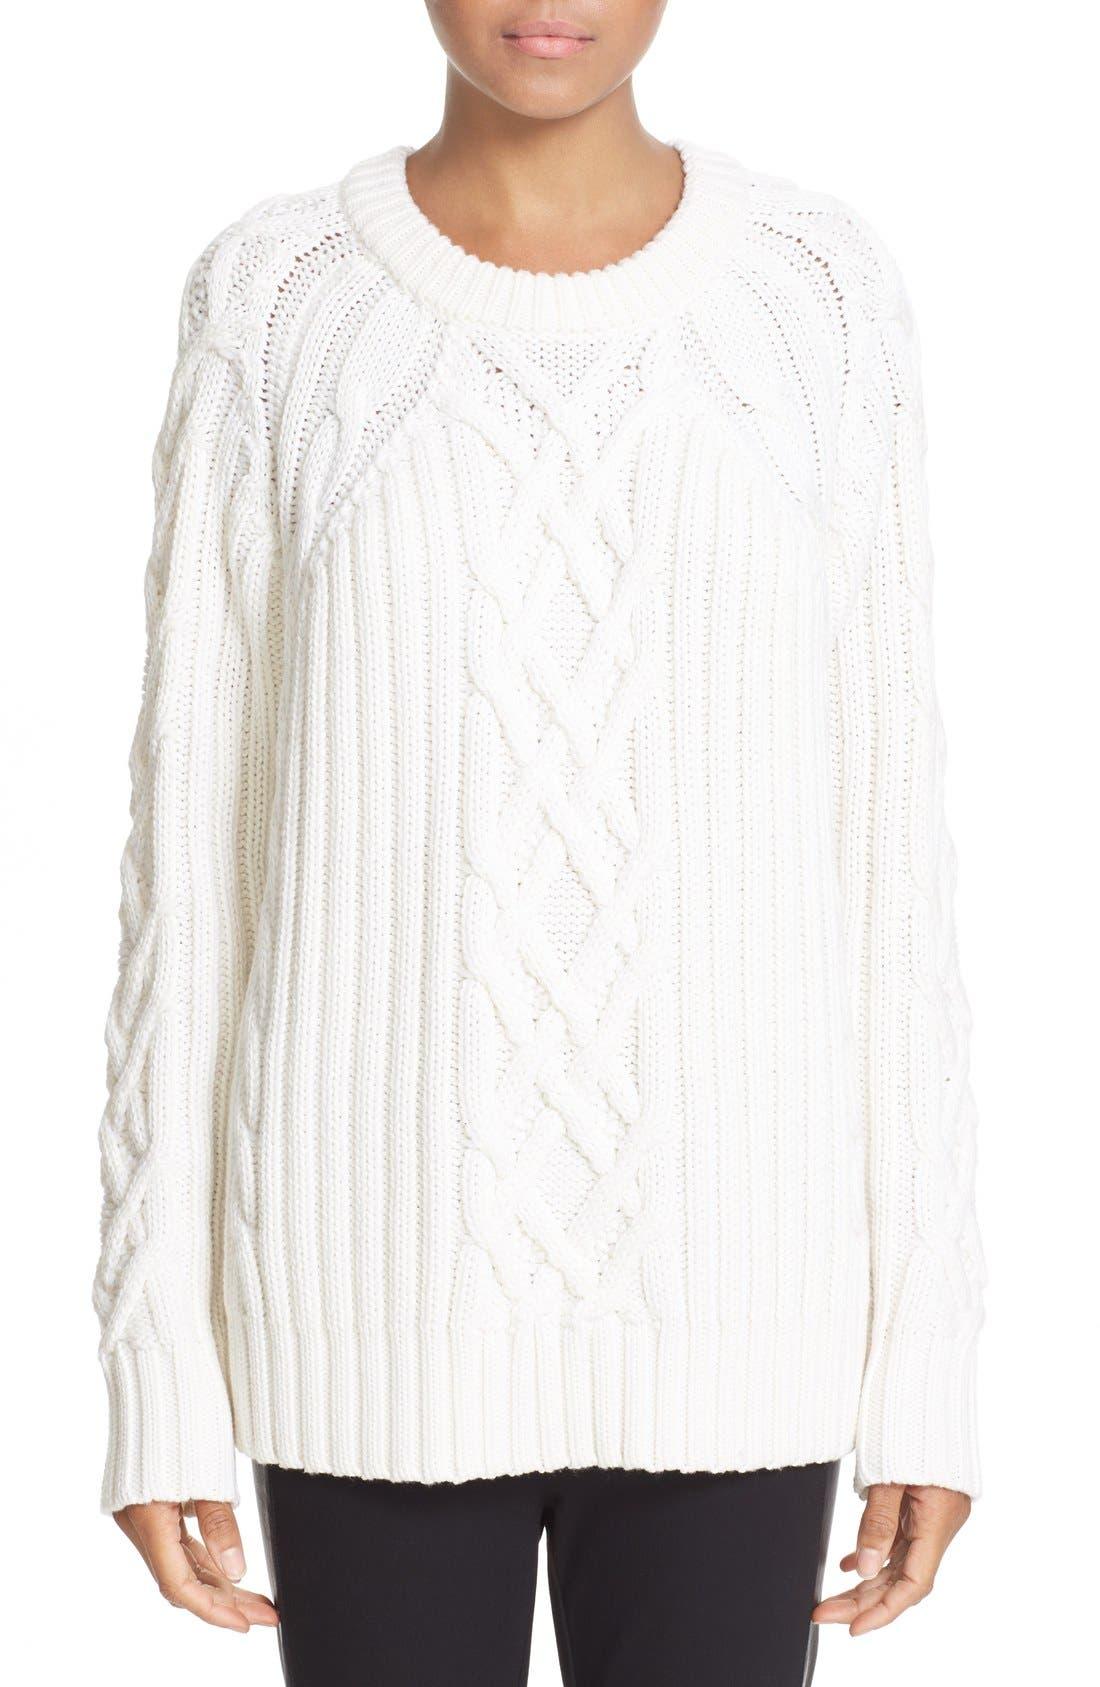 Main Image - rag & bone 'Kiera' Cable Knit Crewneck Sweater